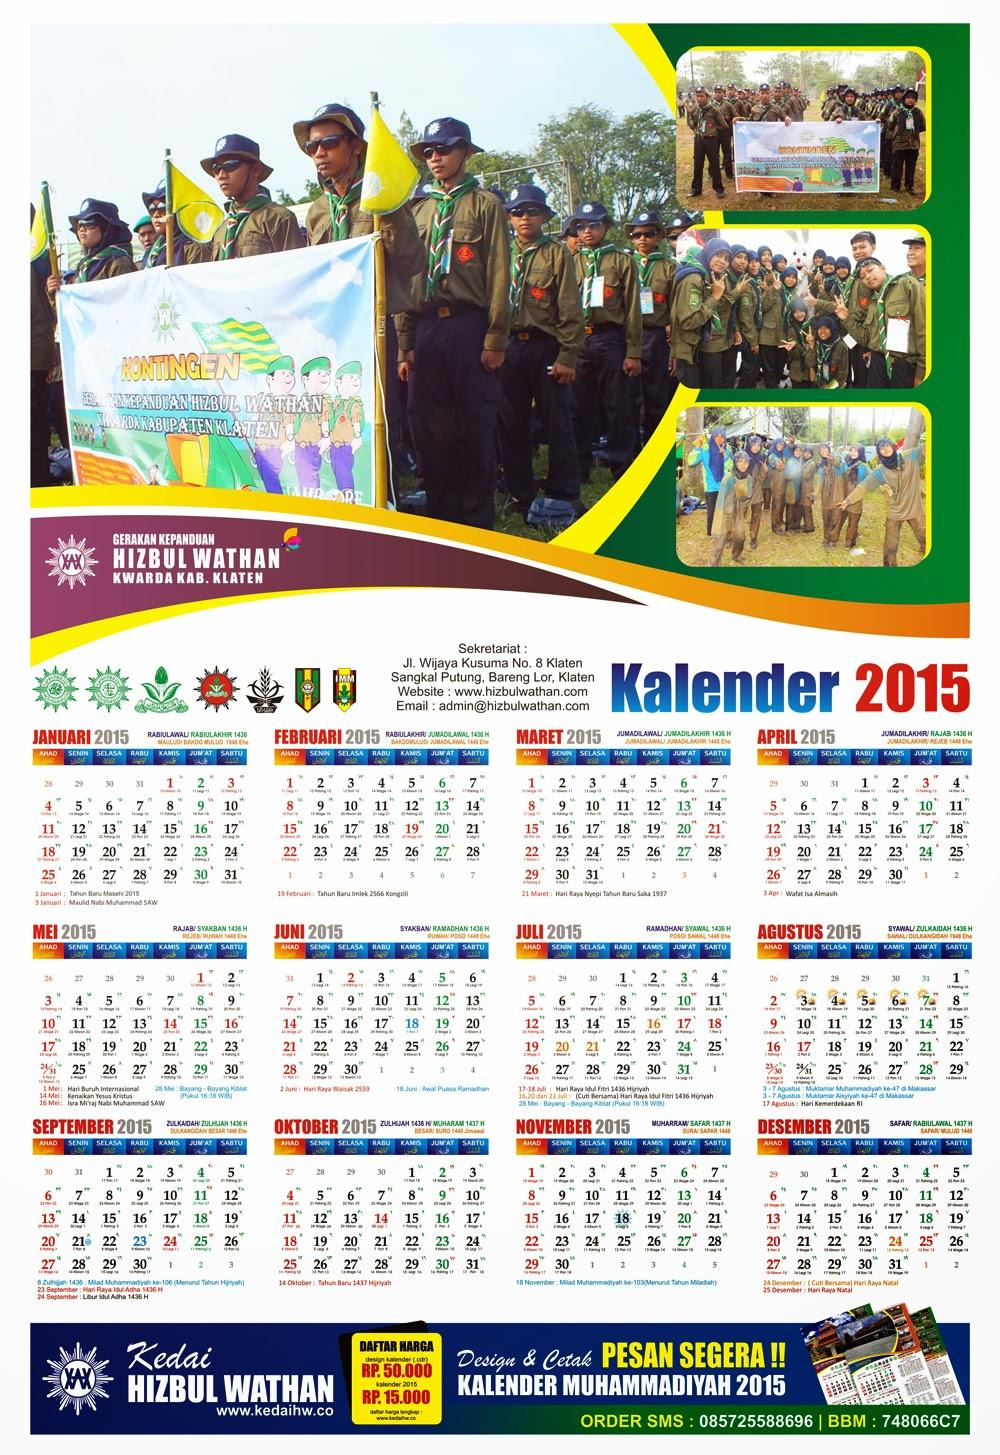 Design Kalender Muhammadiyah 2015 | Kedai Hizbul Wathan